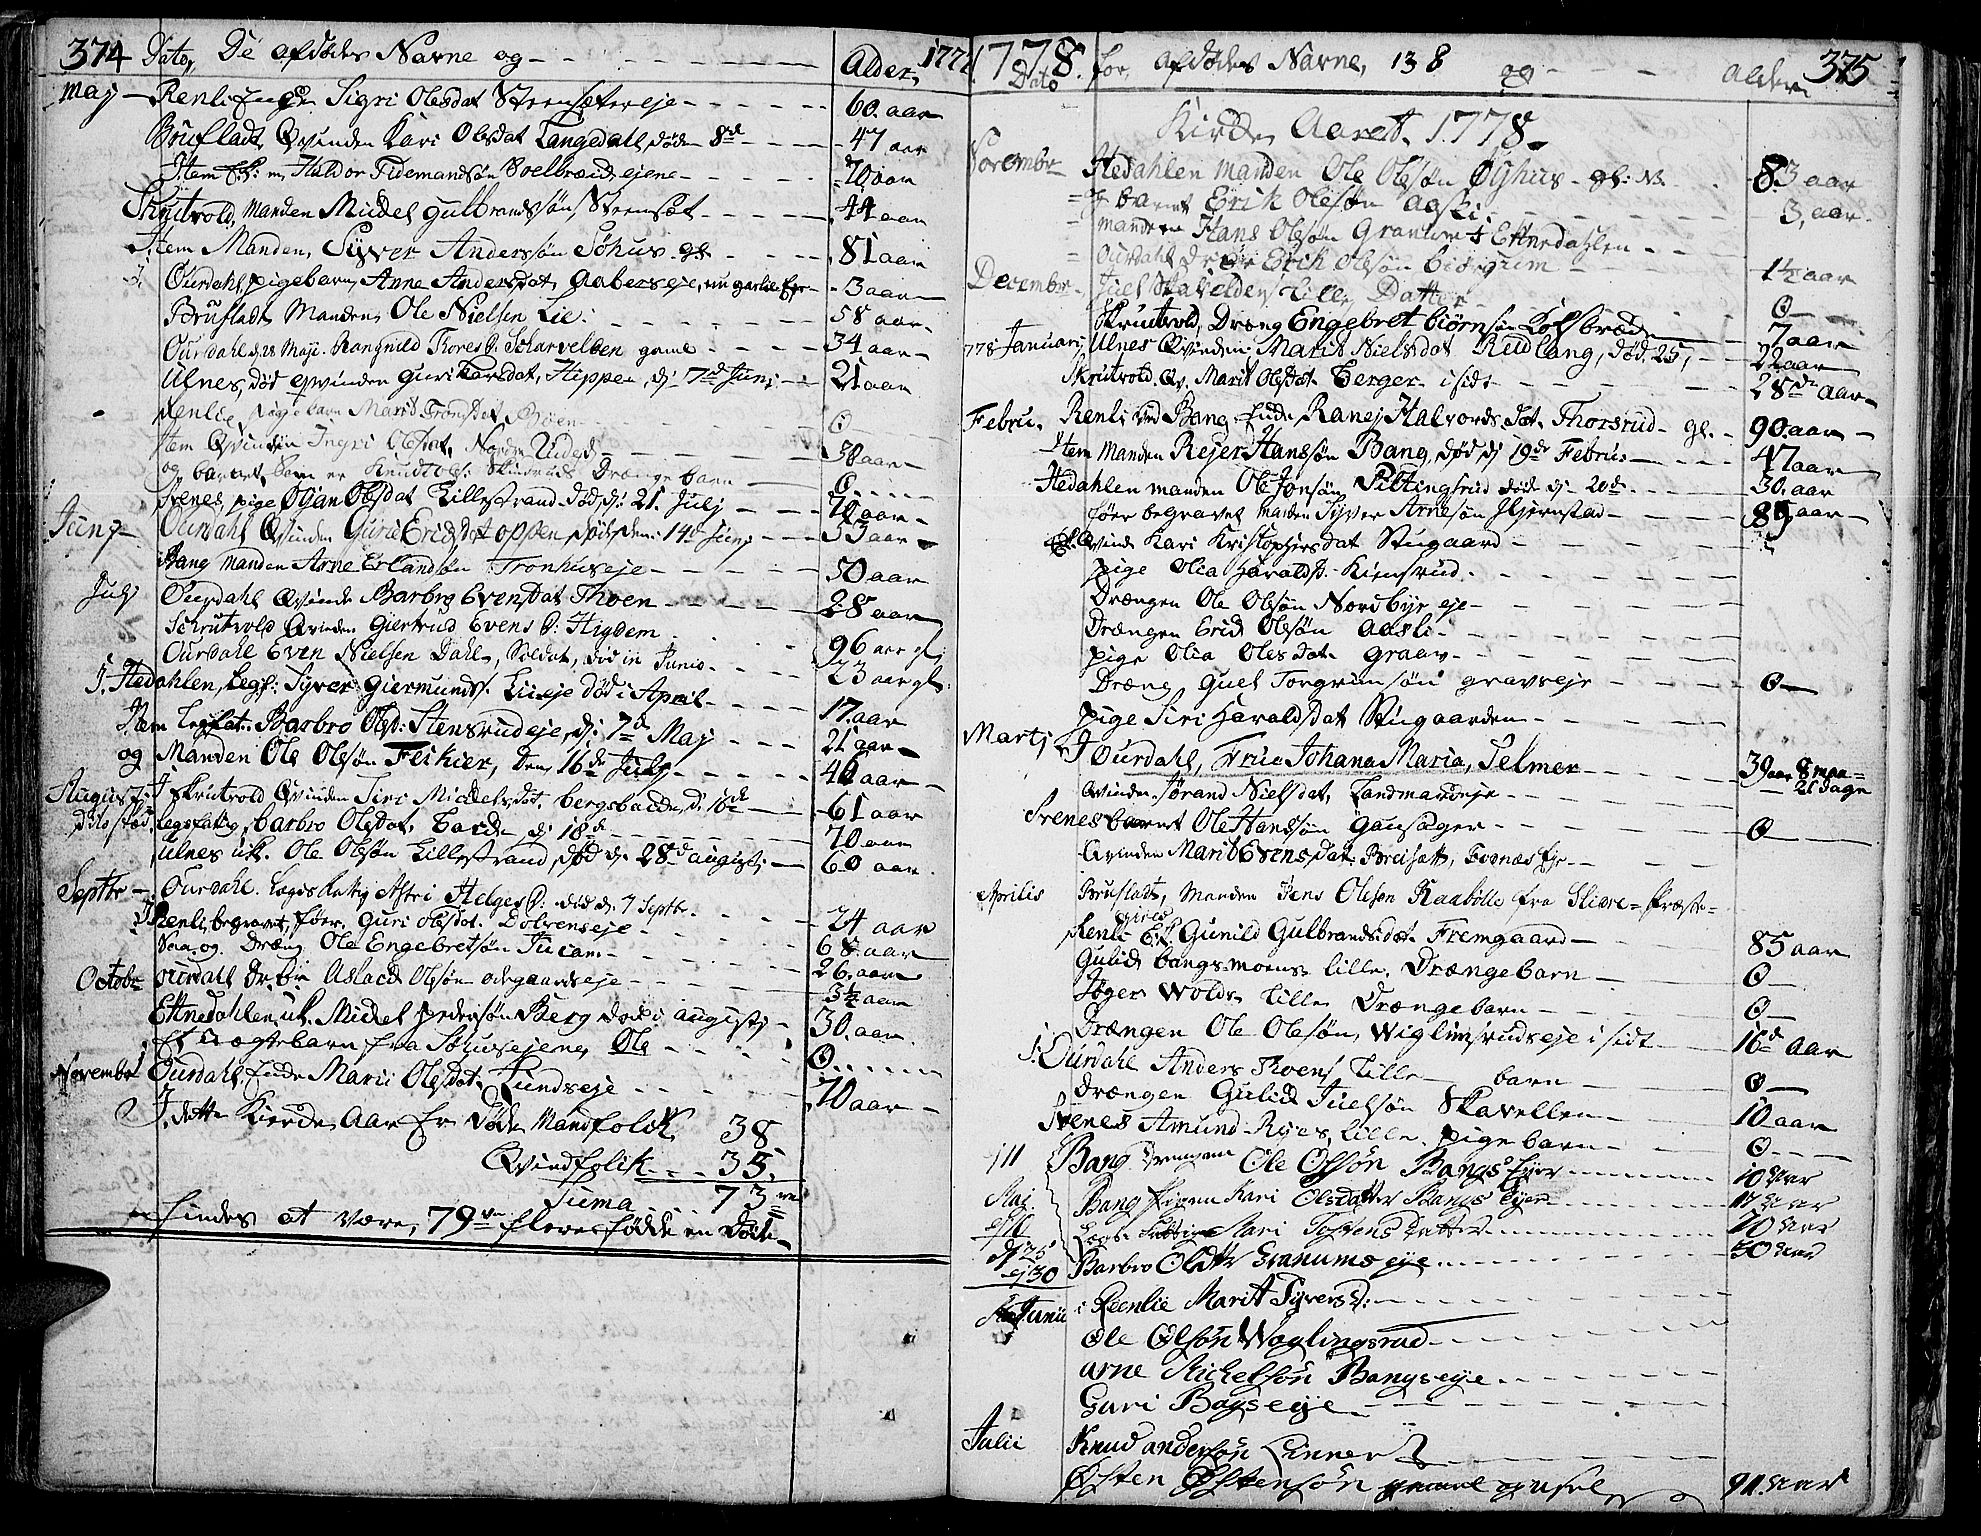 SAH, Aurdal prestekontor, Ministerialbok nr. 5, 1763-1781, s. 374-375